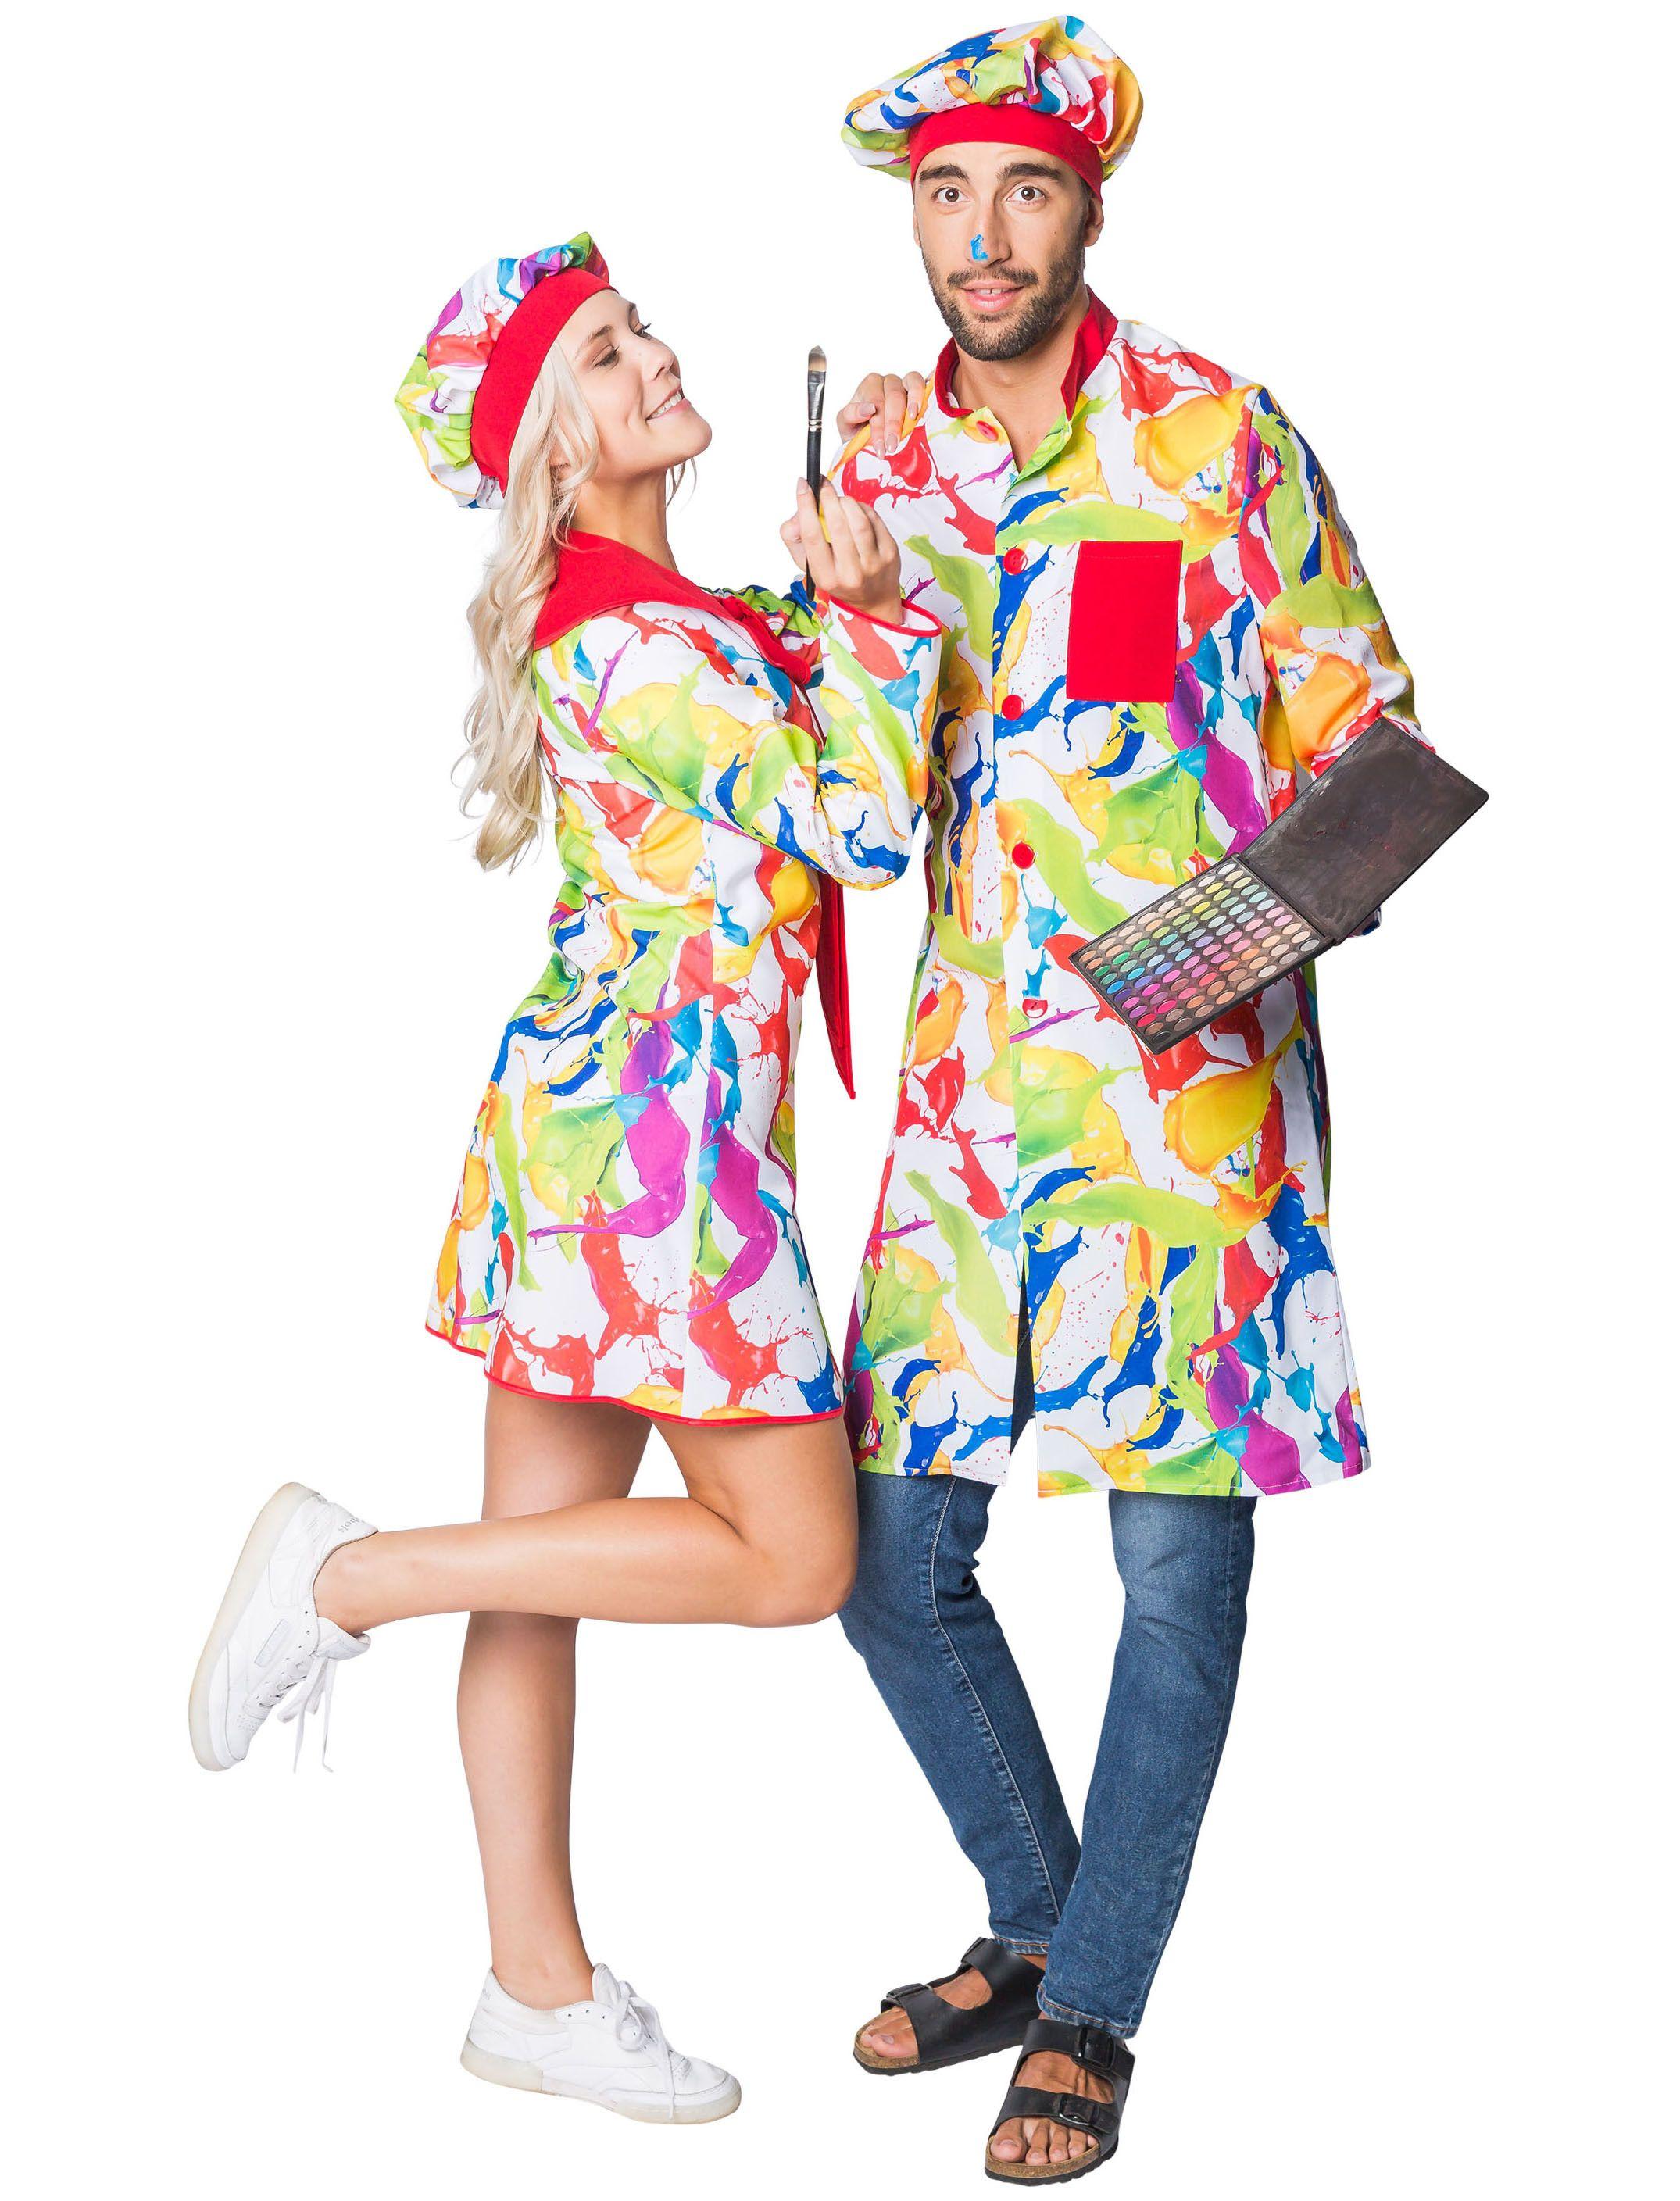 20a2aa7aa51d44 Paarkostüm Maler » Deiters  Paarkostüm  couple  damen  herren  paar  kostüm